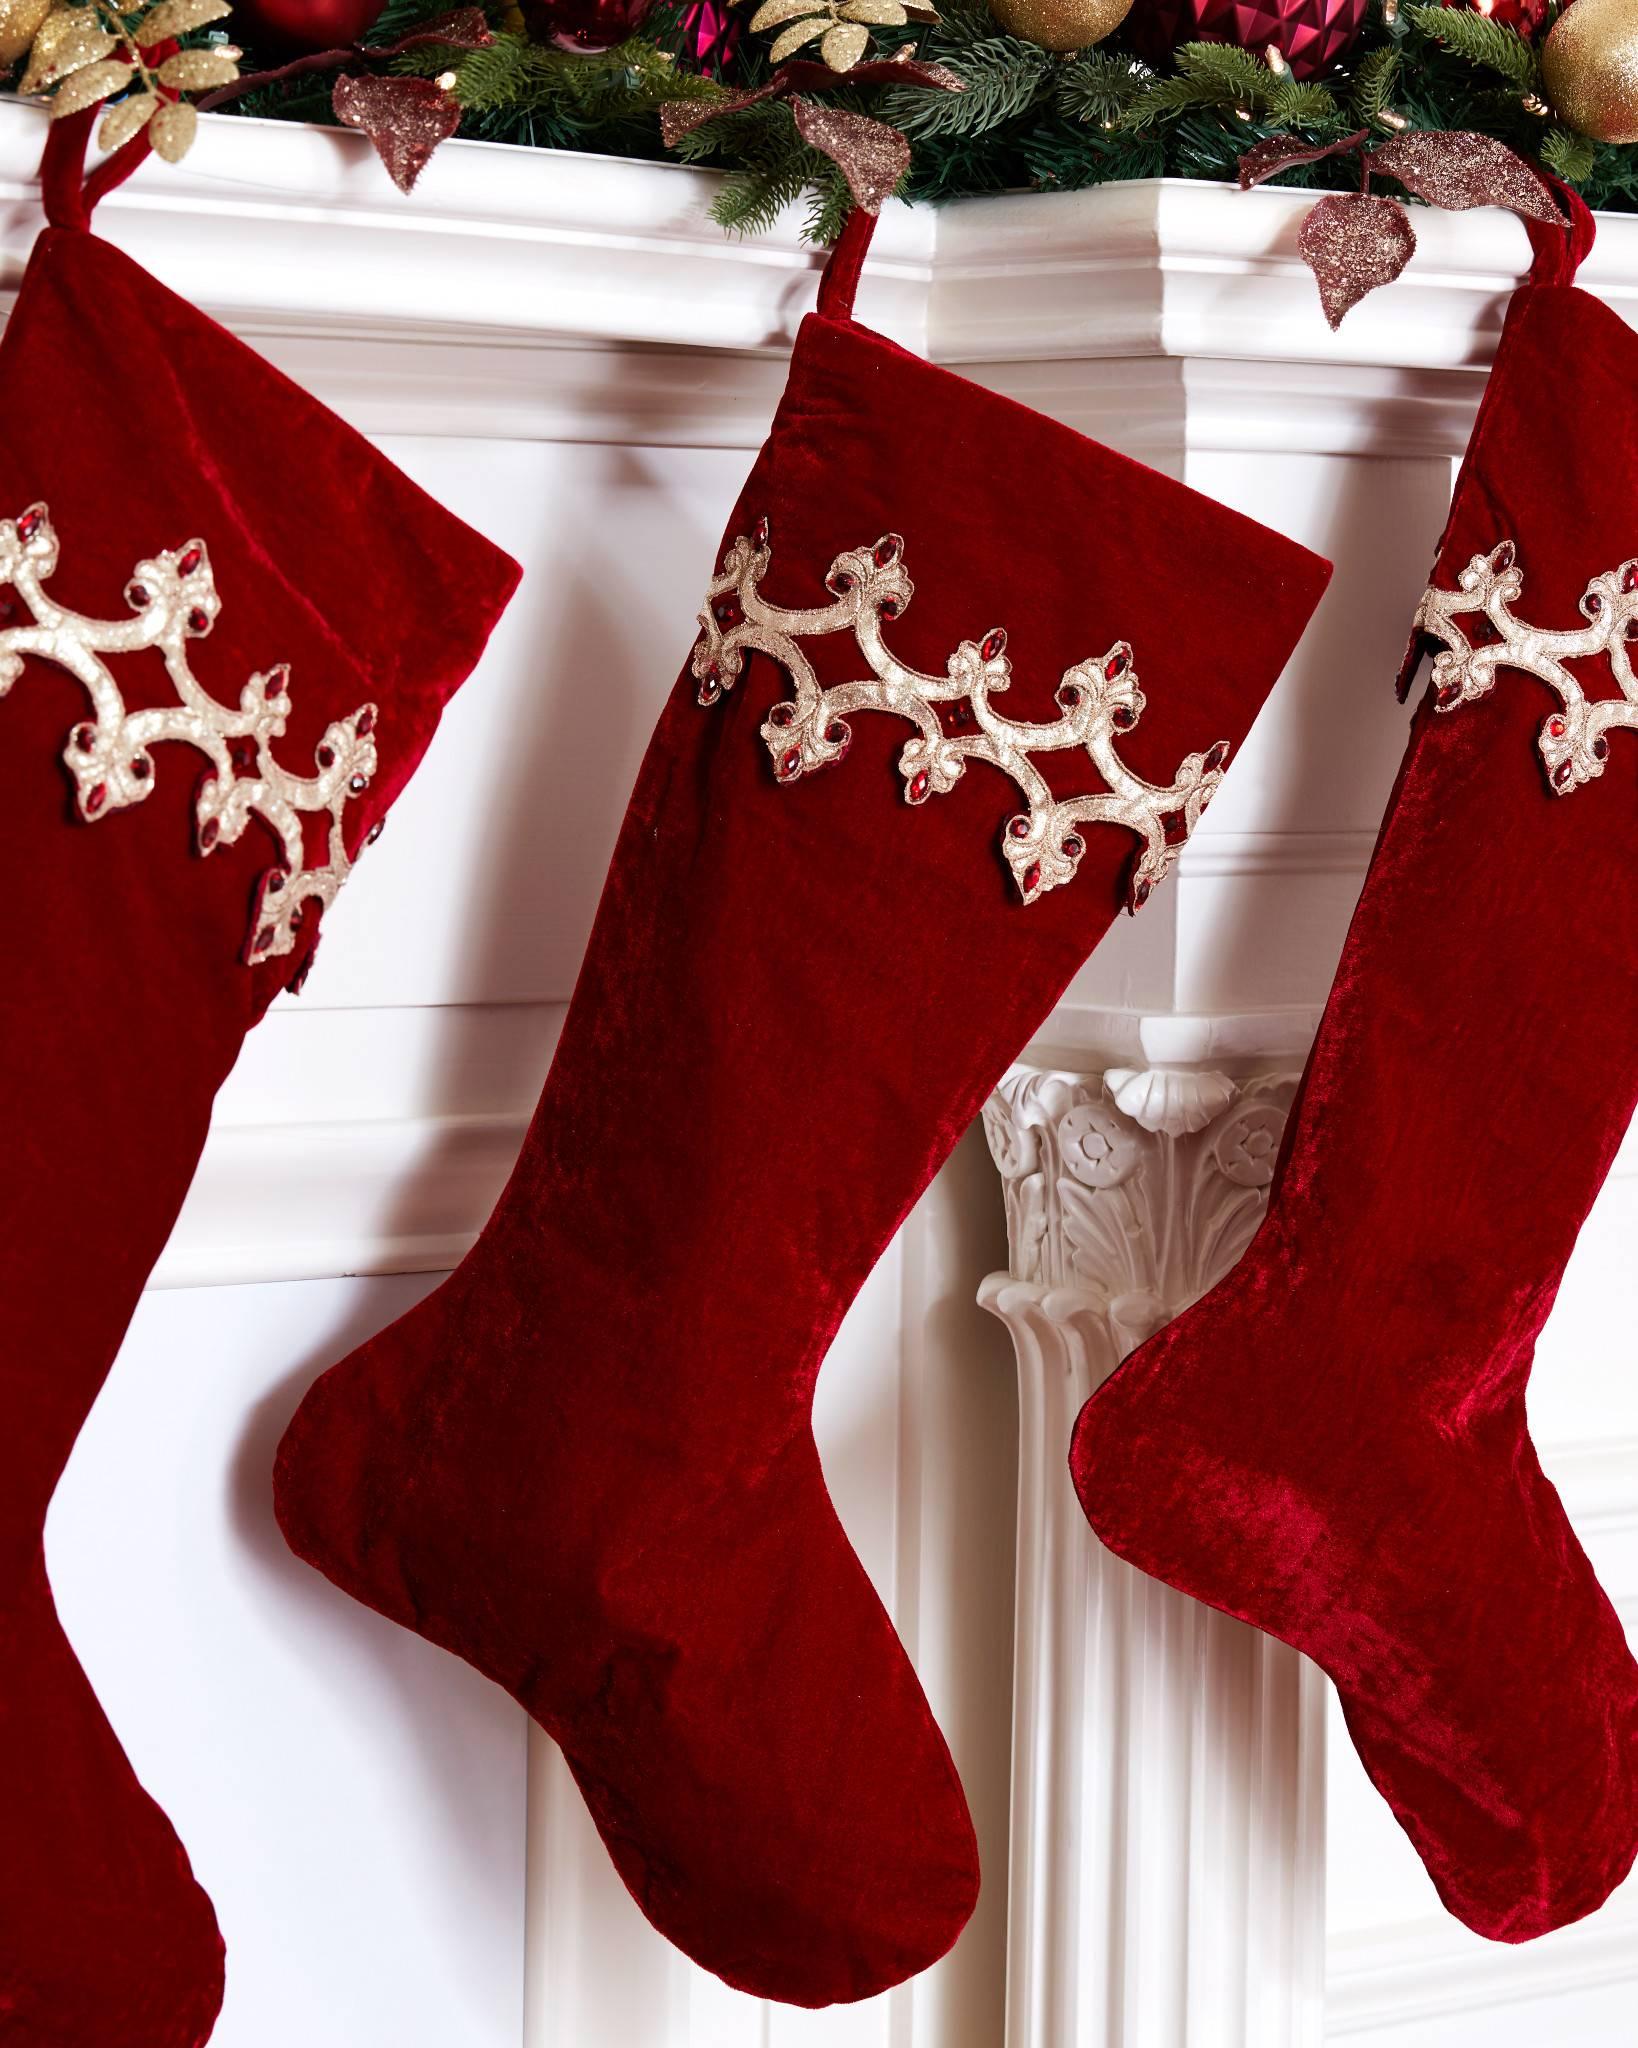 ... Royal Garnet Stocking by Balsam Hill ...